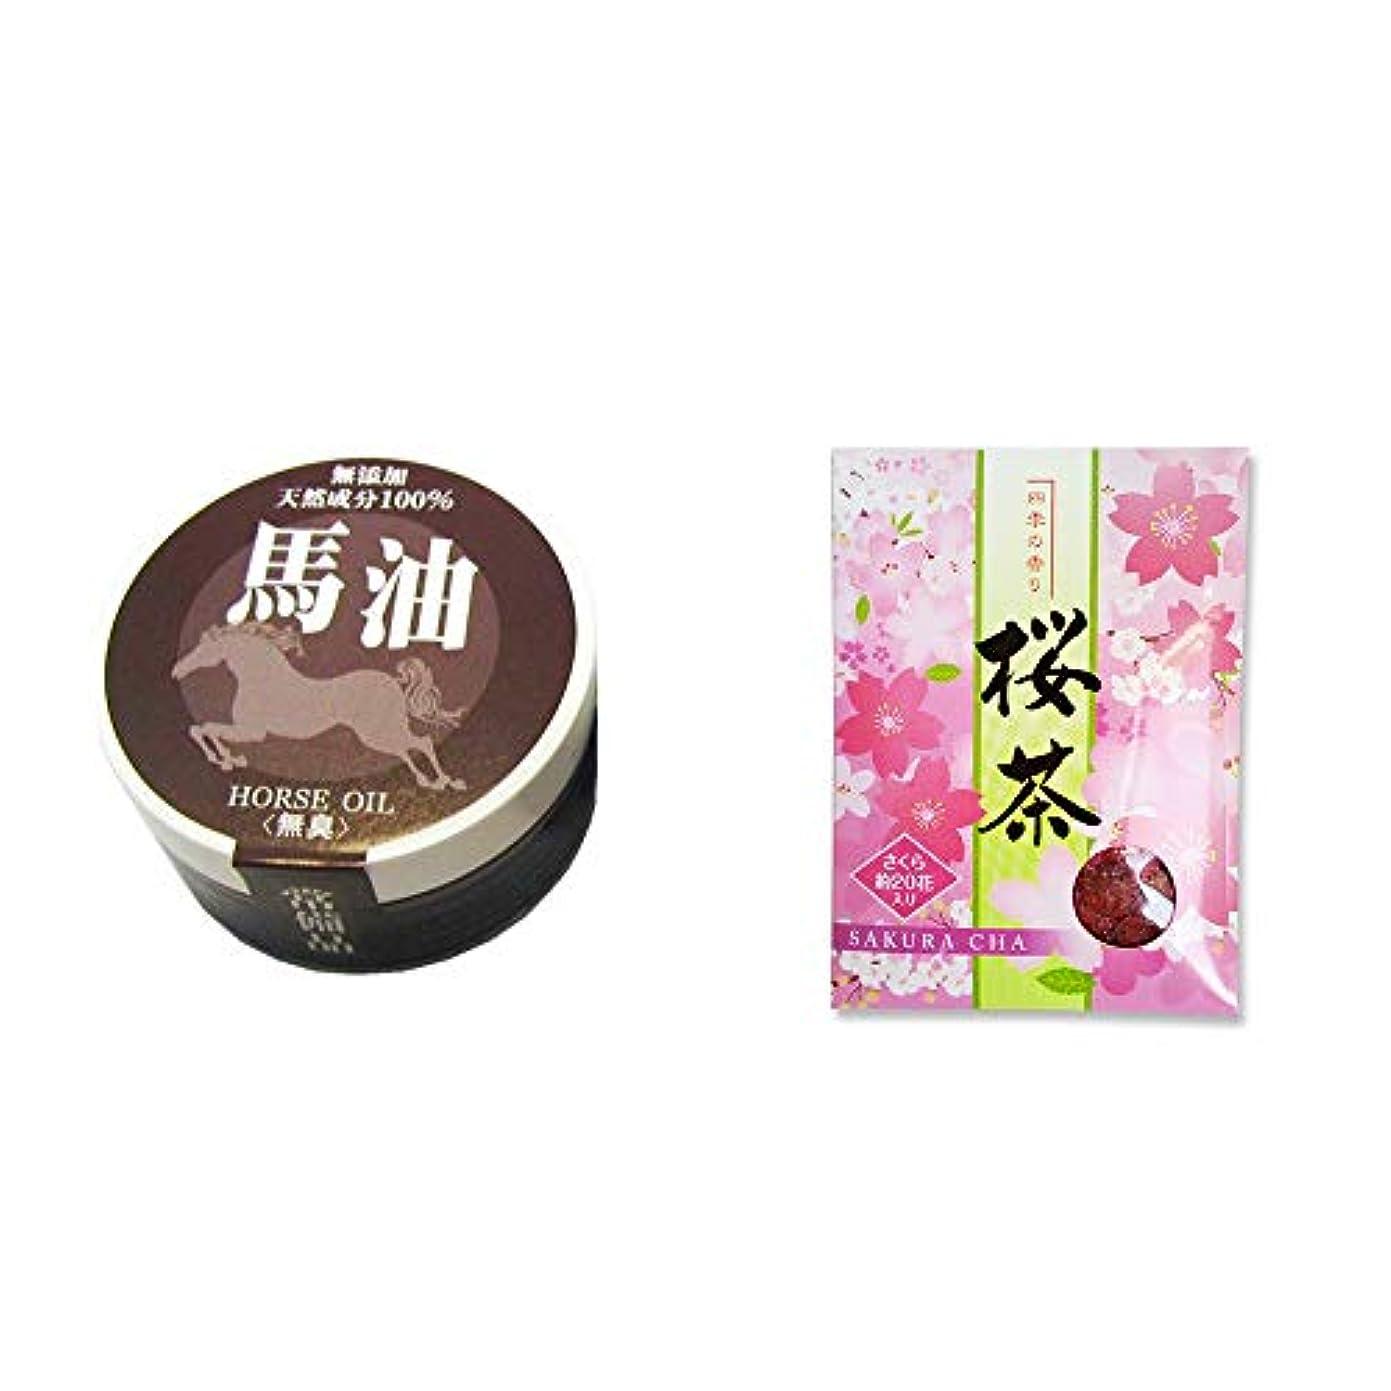 草マルクス主義者支給[2点セット] 無添加天然成分100% 馬油[無香料](38g)?桜茶(40g)